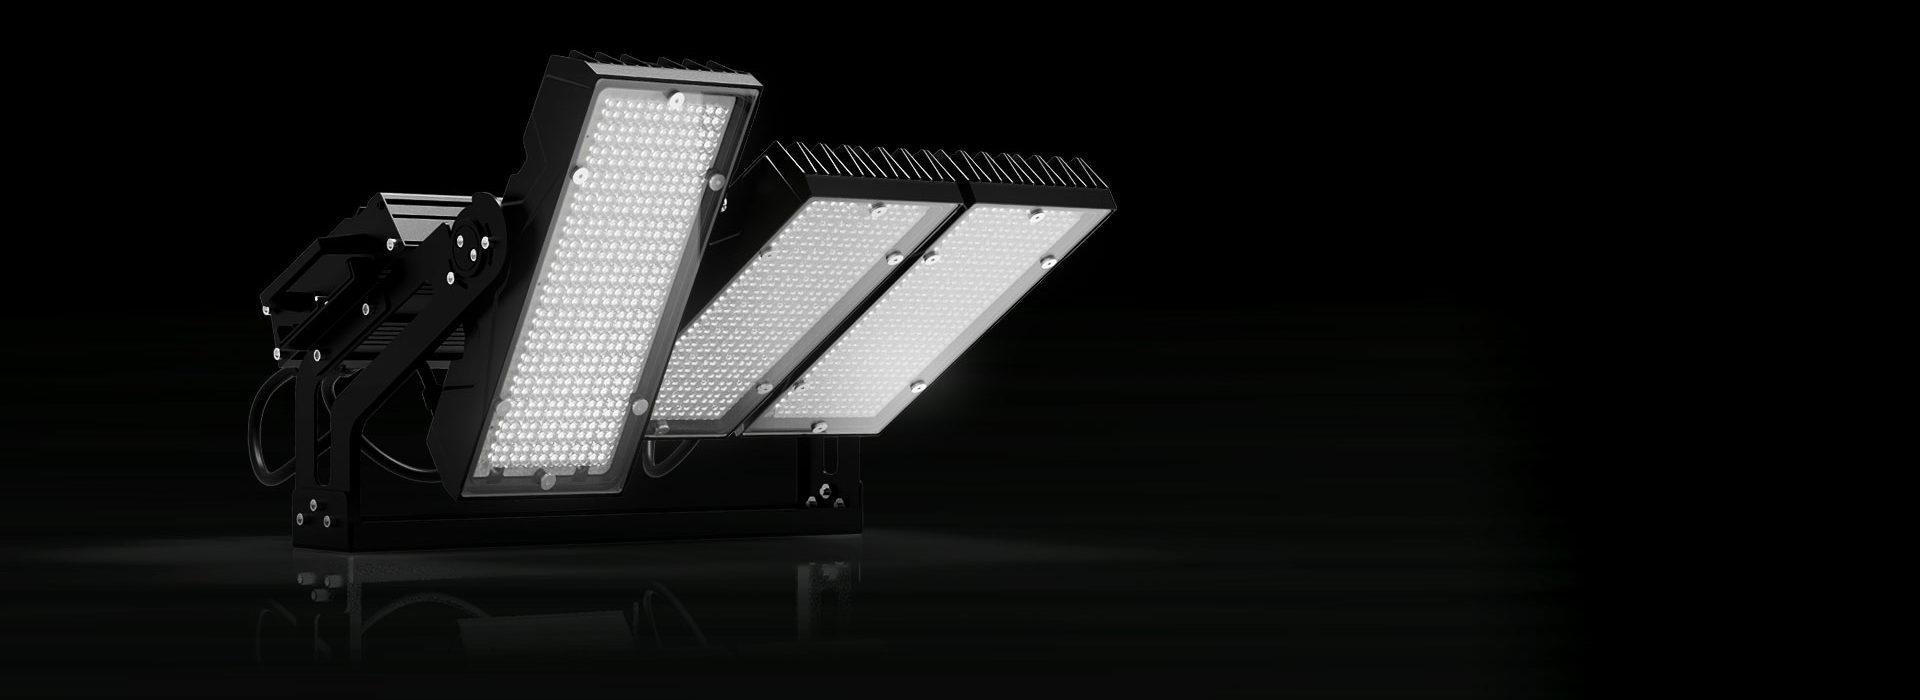 HiMast-led-flood-light